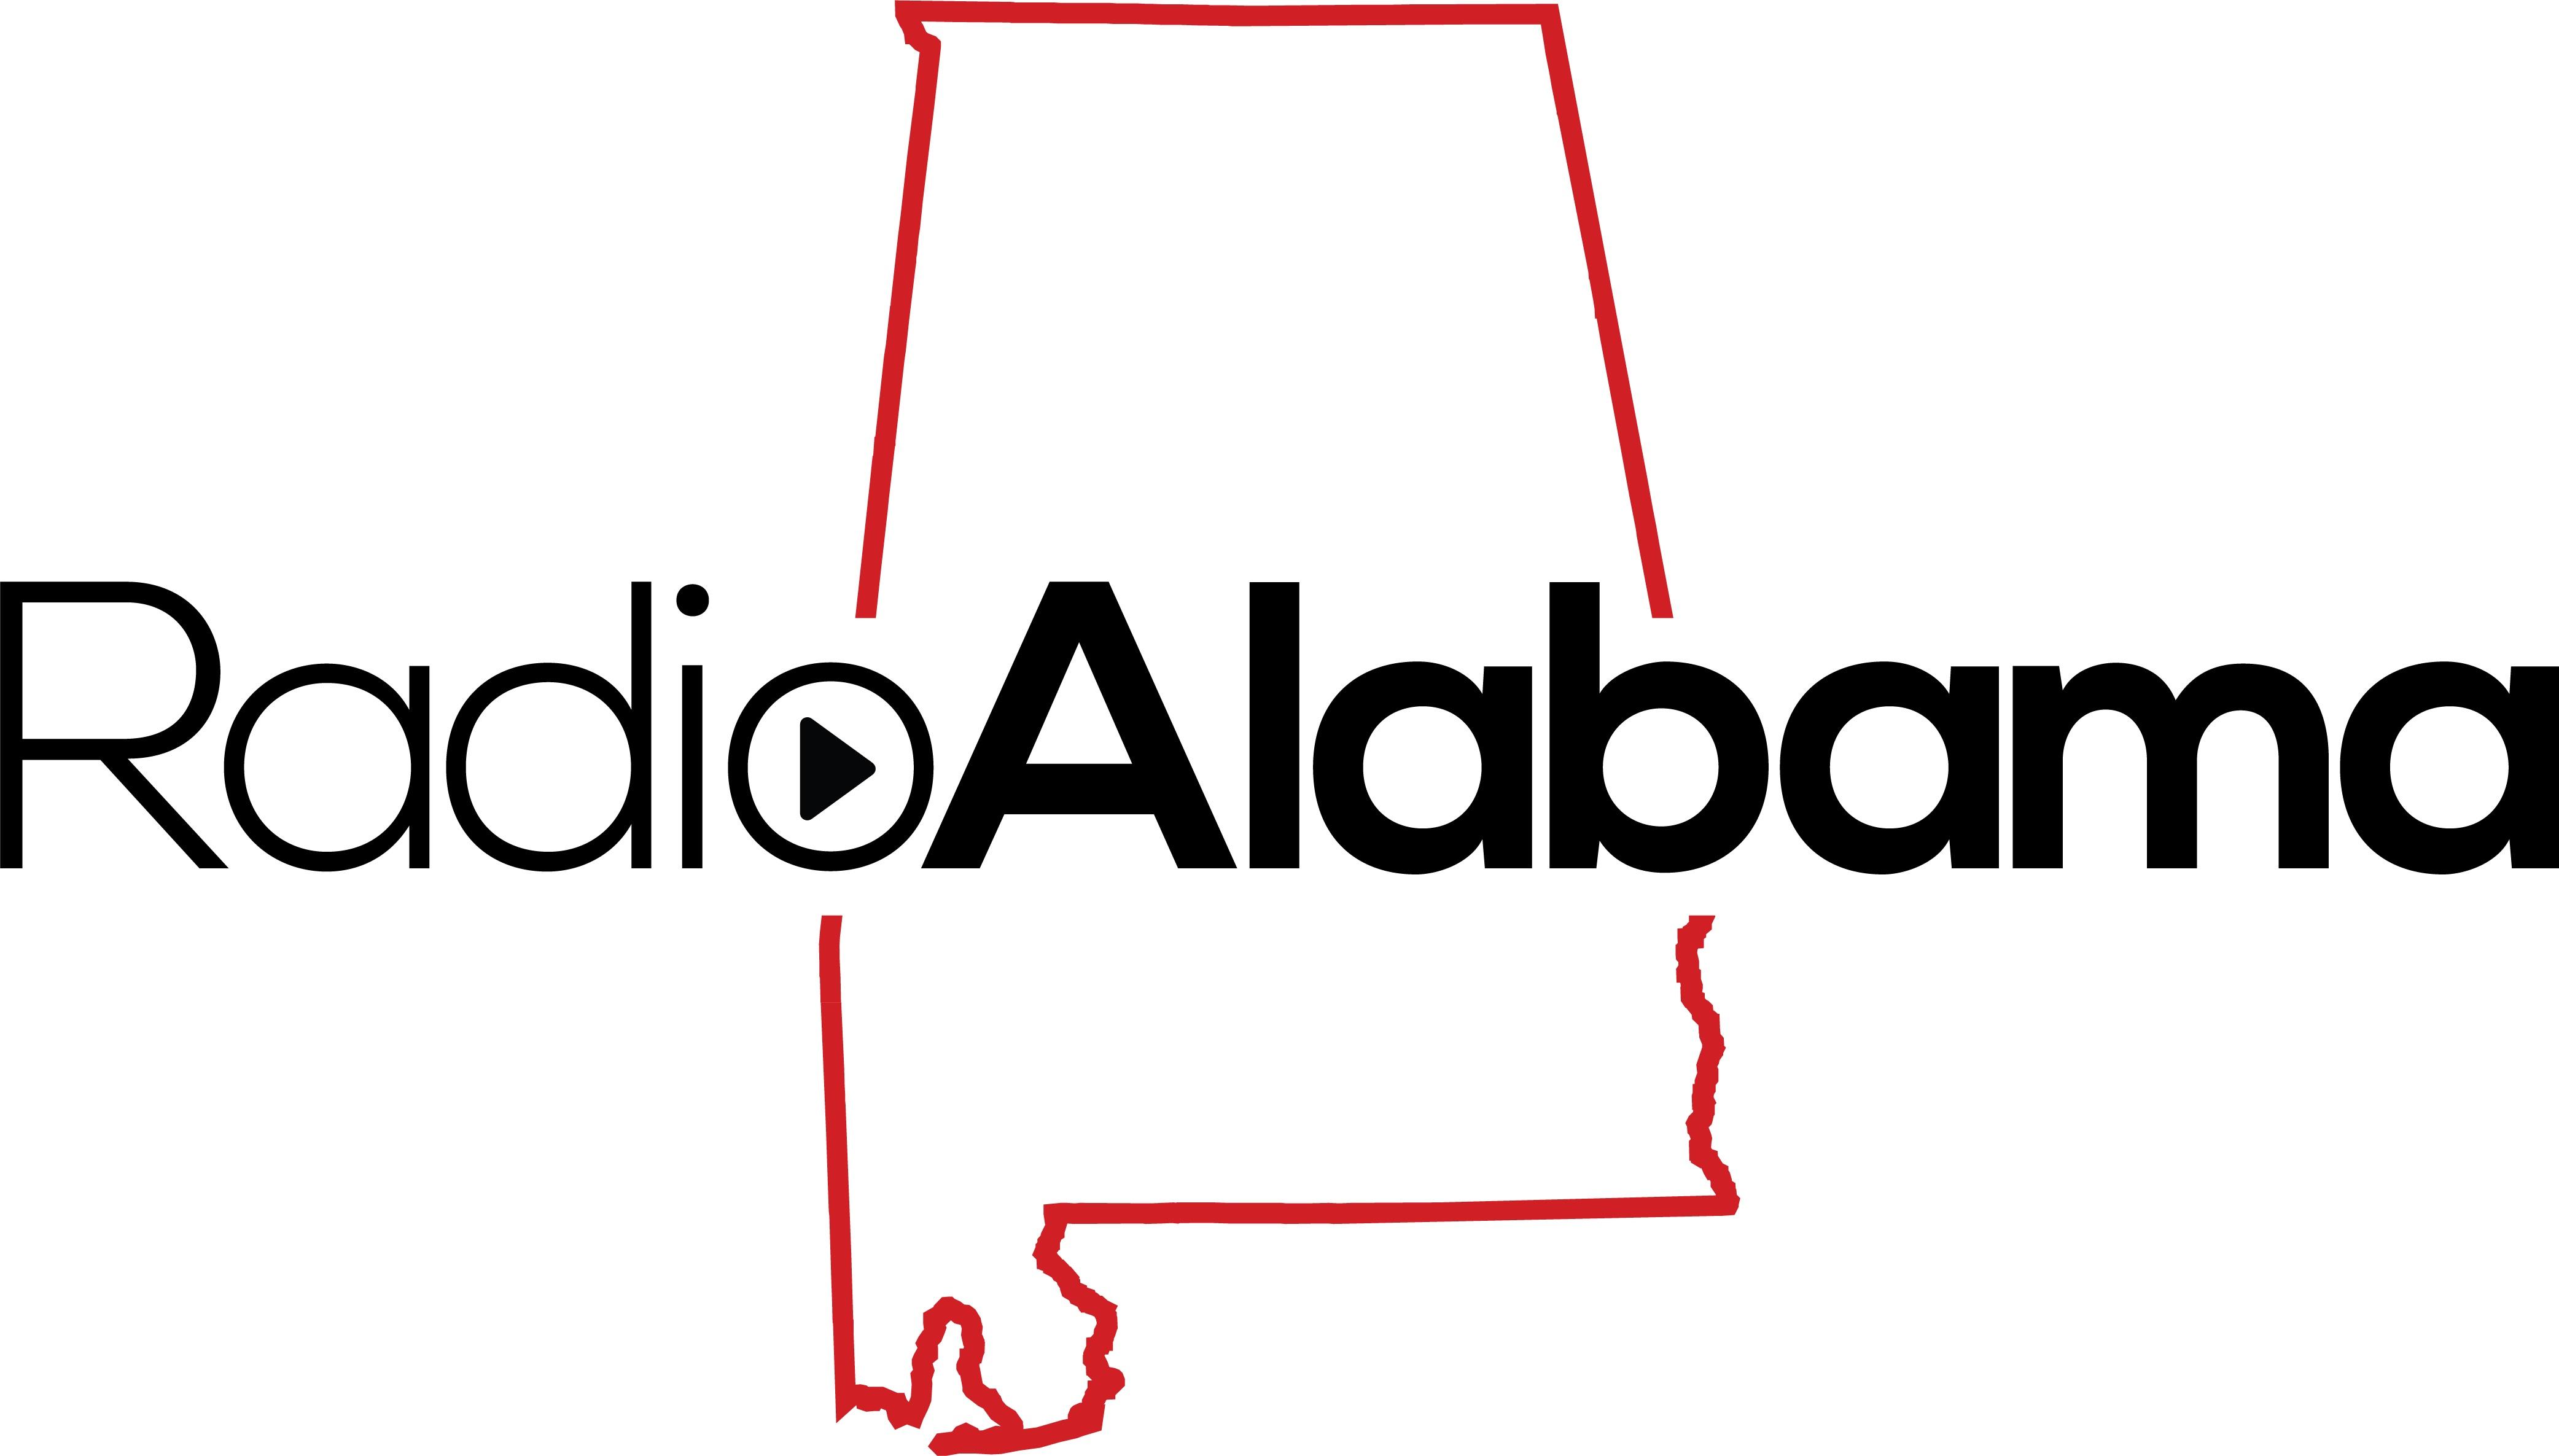 https://www.radioalabamasports.net/